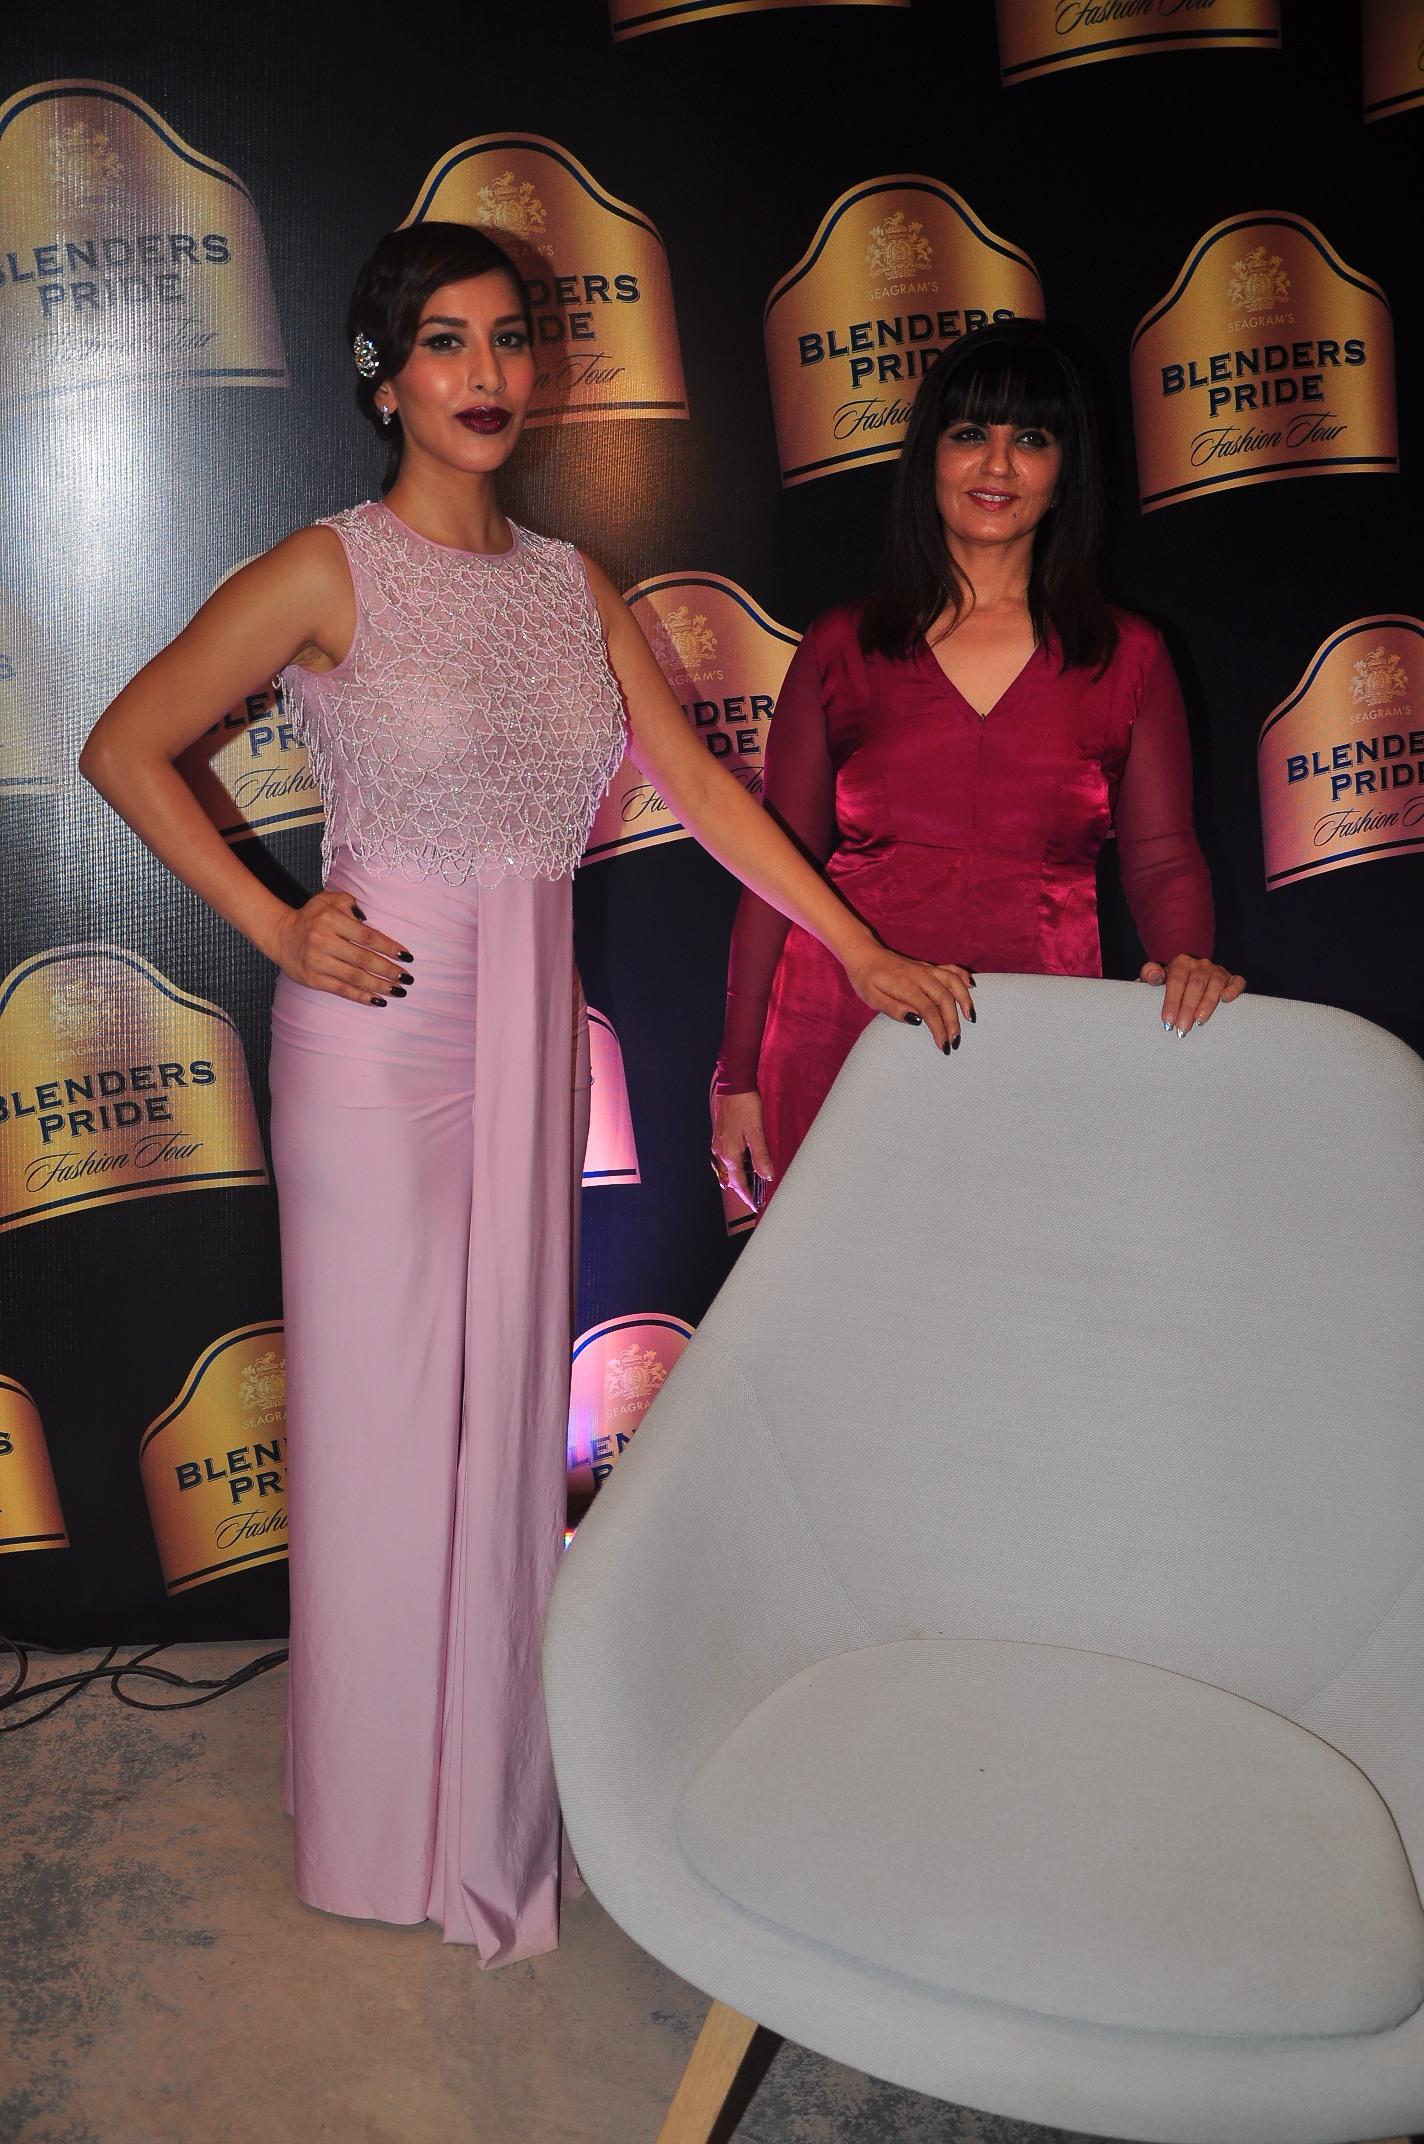 Sophie Choudhary & Neeta Lulla